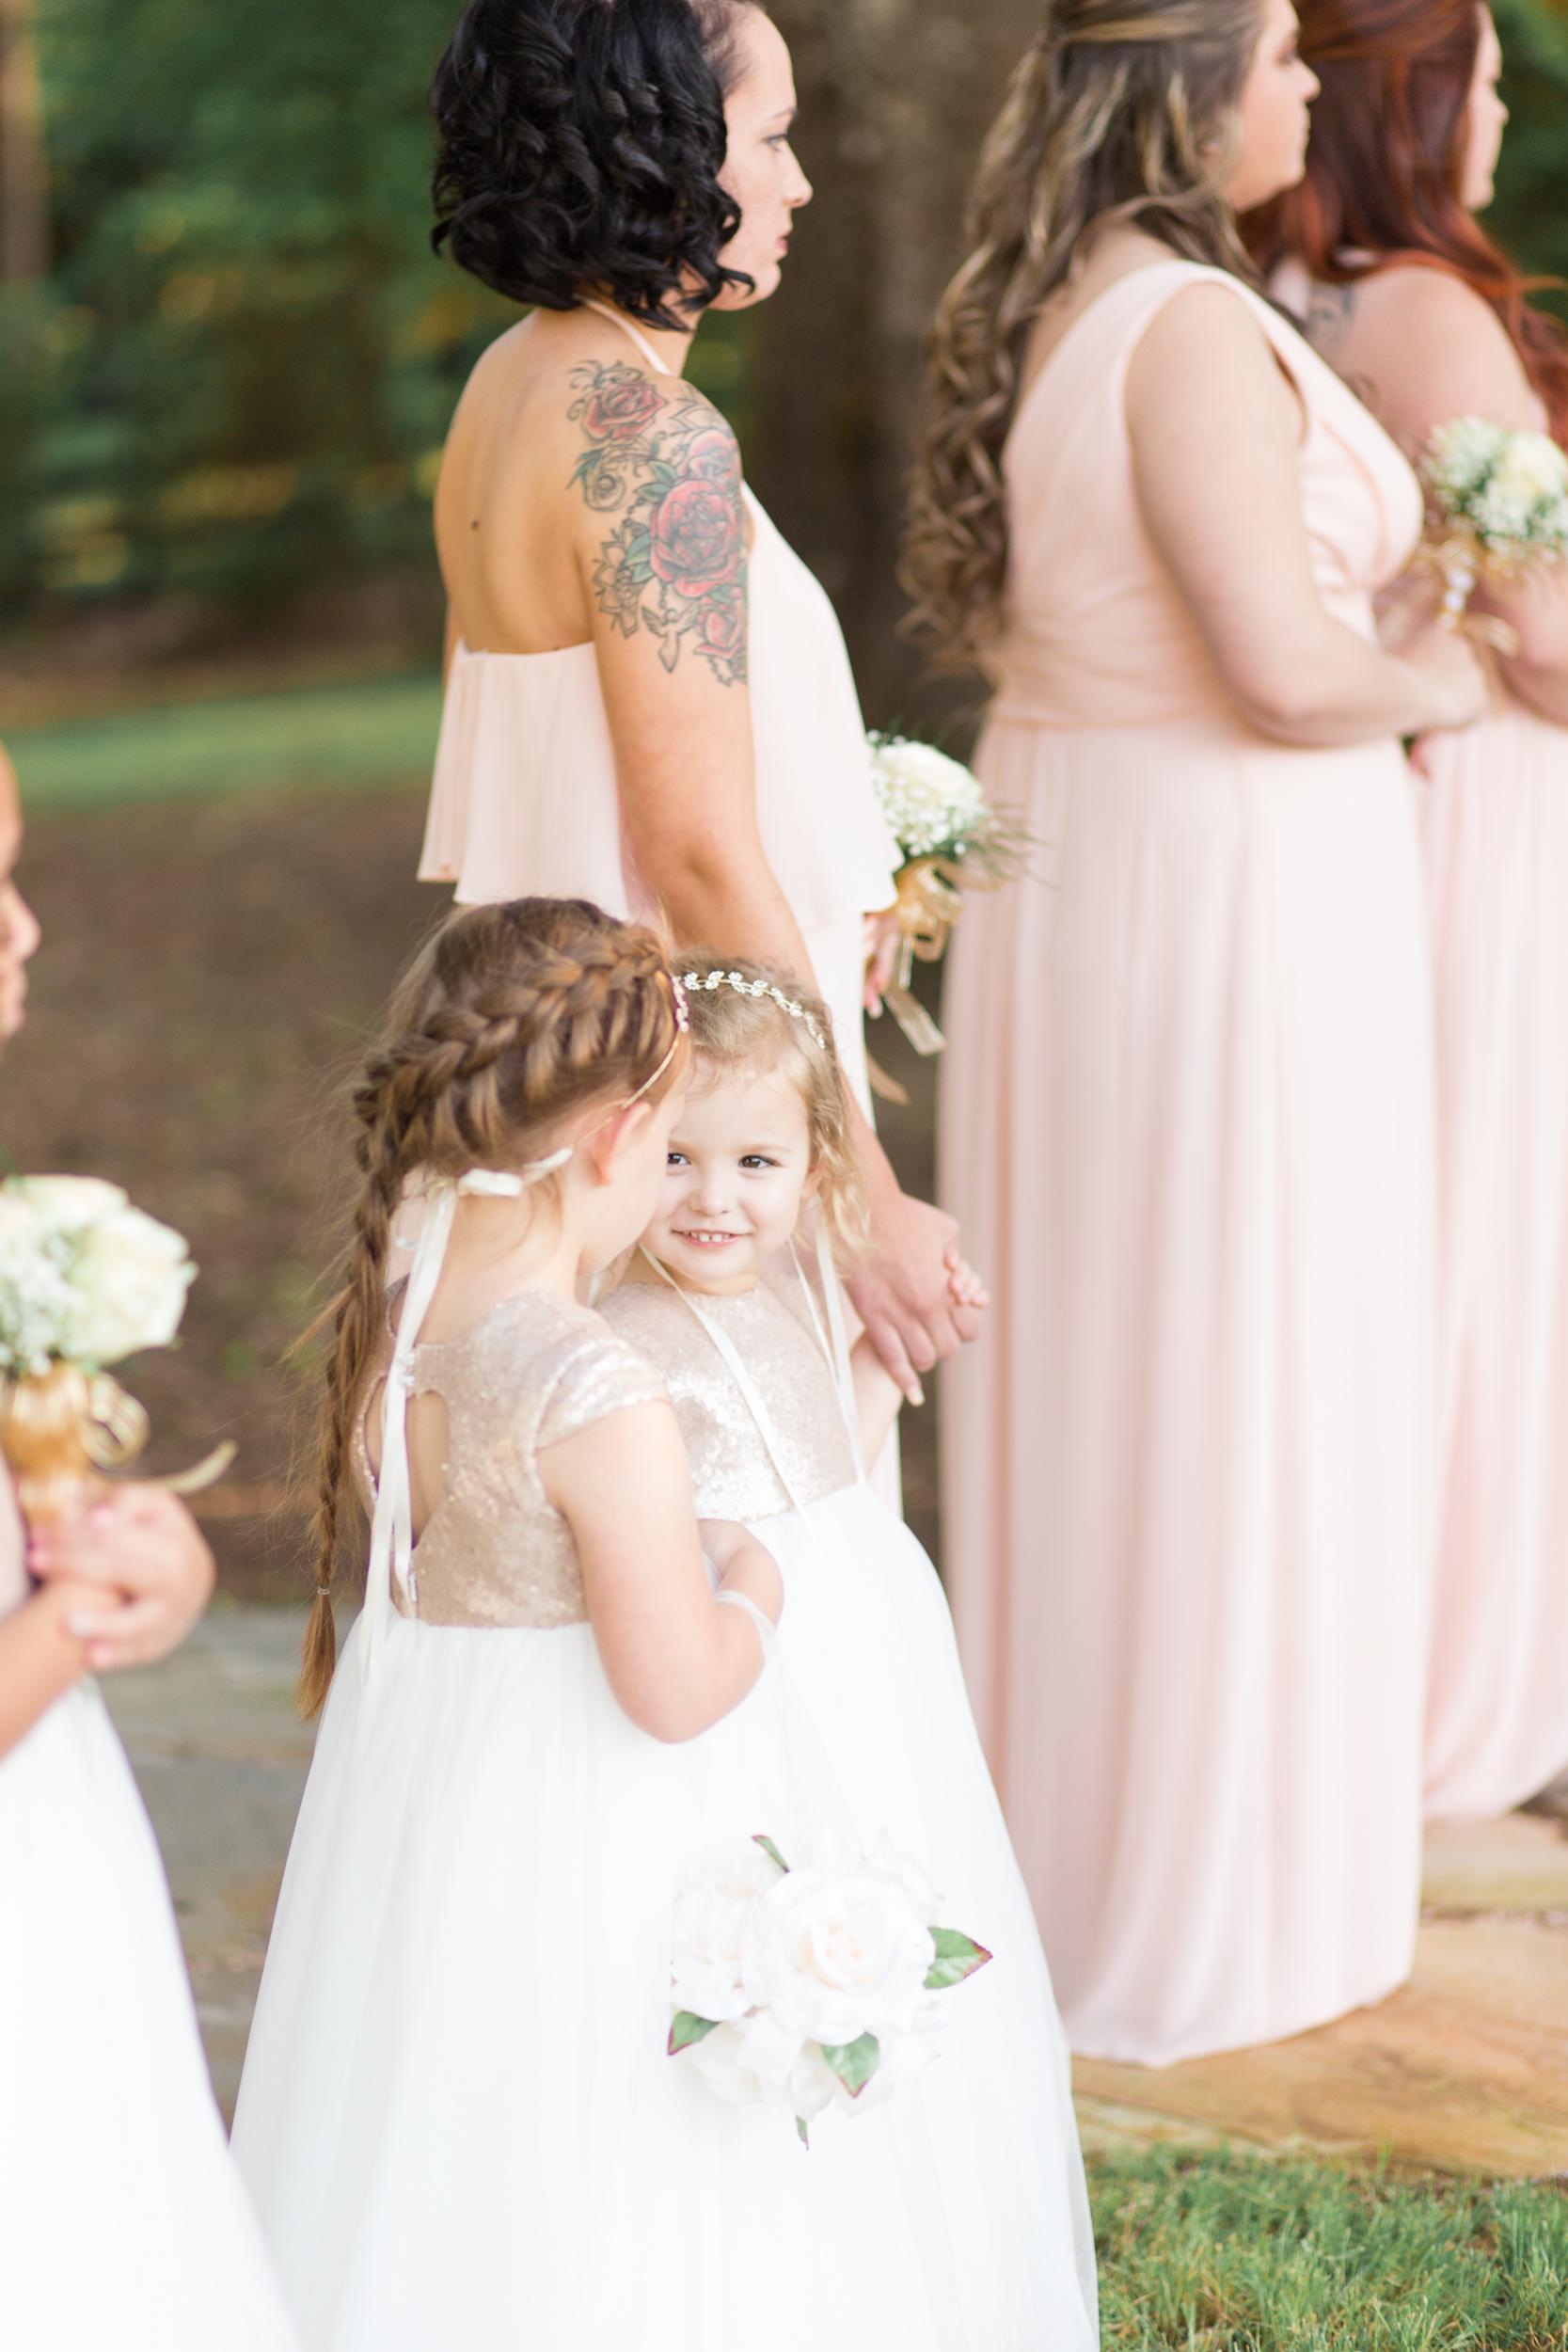 Zihlman-East TX Wedding_Kelsie Hendricks Photography_The Folmar Tyler Texas-103.jpg